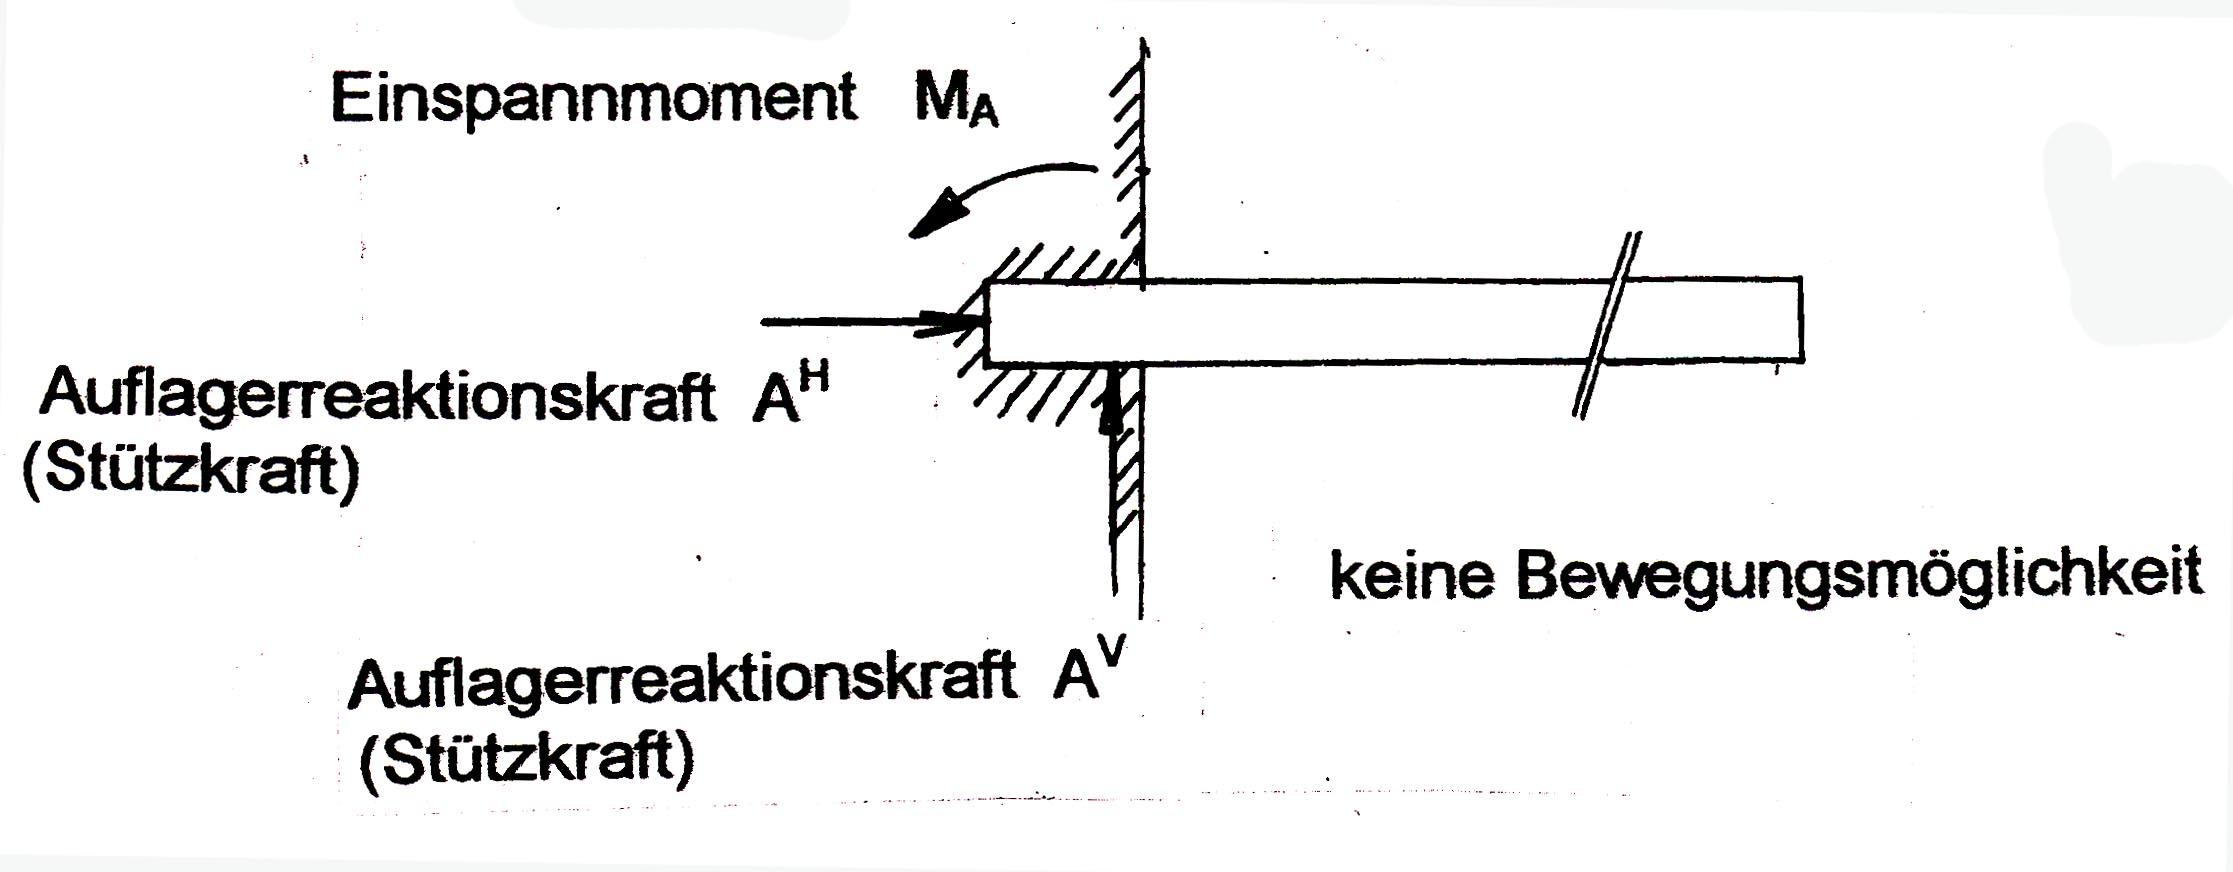 3 berechnung derauflagerreaktionskr fte. Black Bedroom Furniture Sets. Home Design Ideas